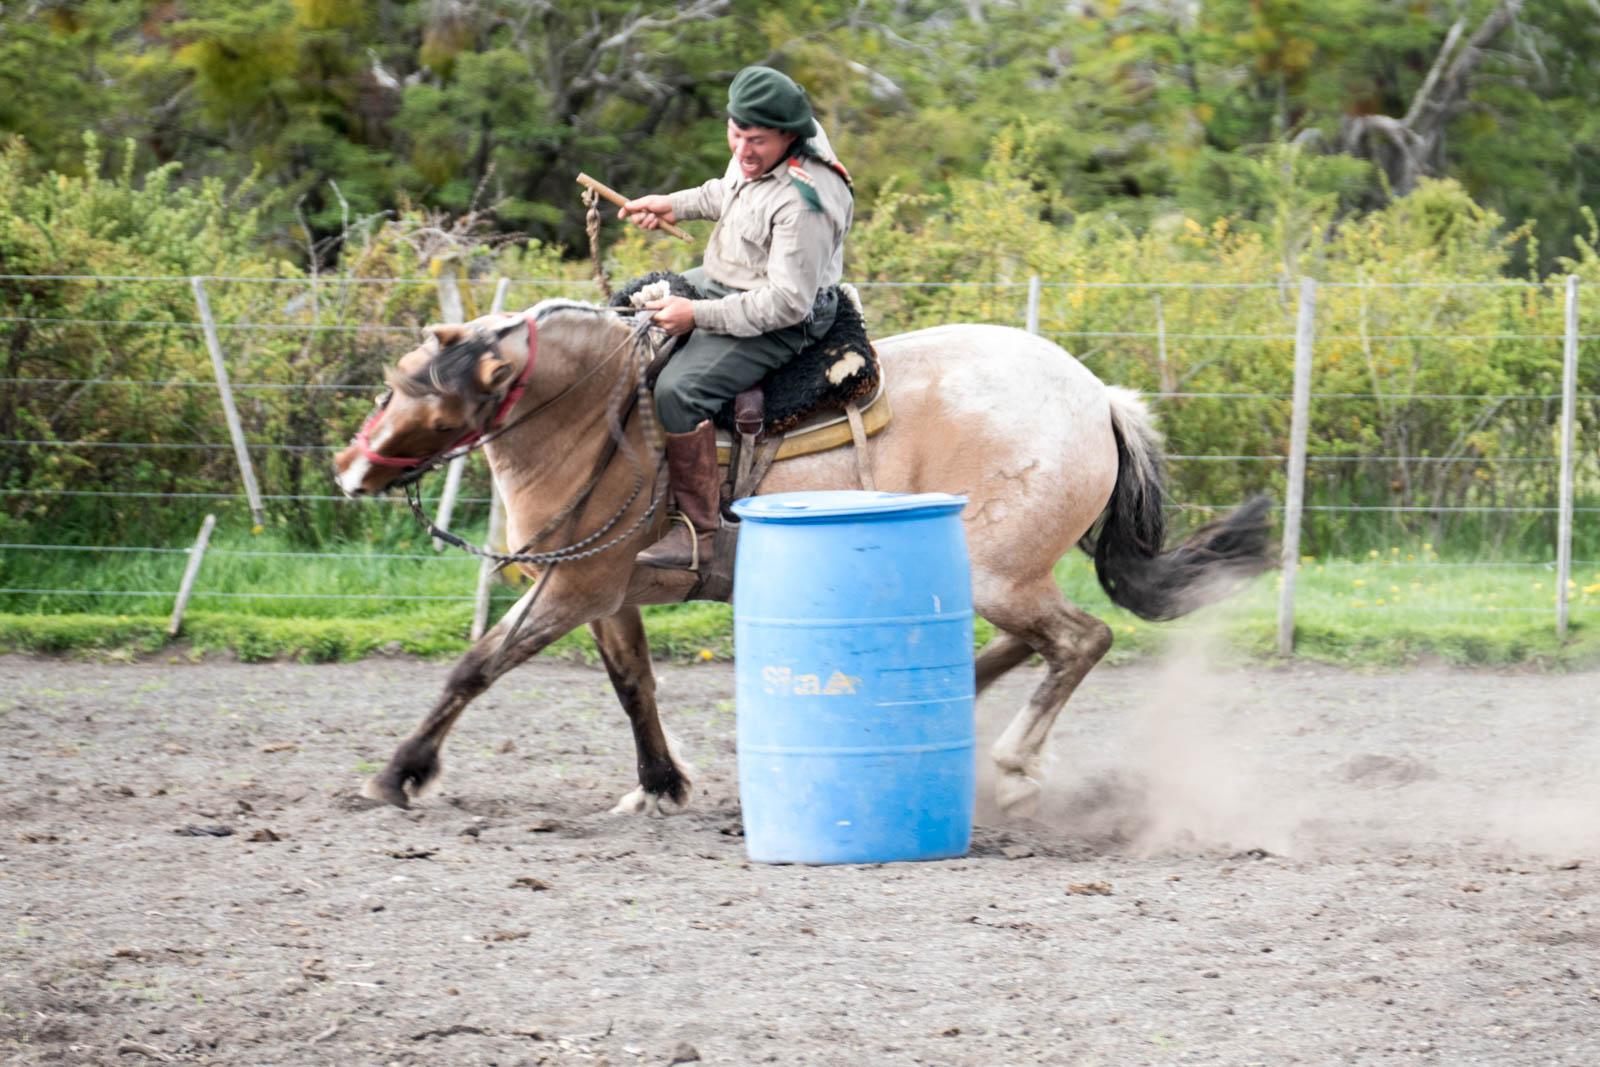 Gauchos running the barrel race